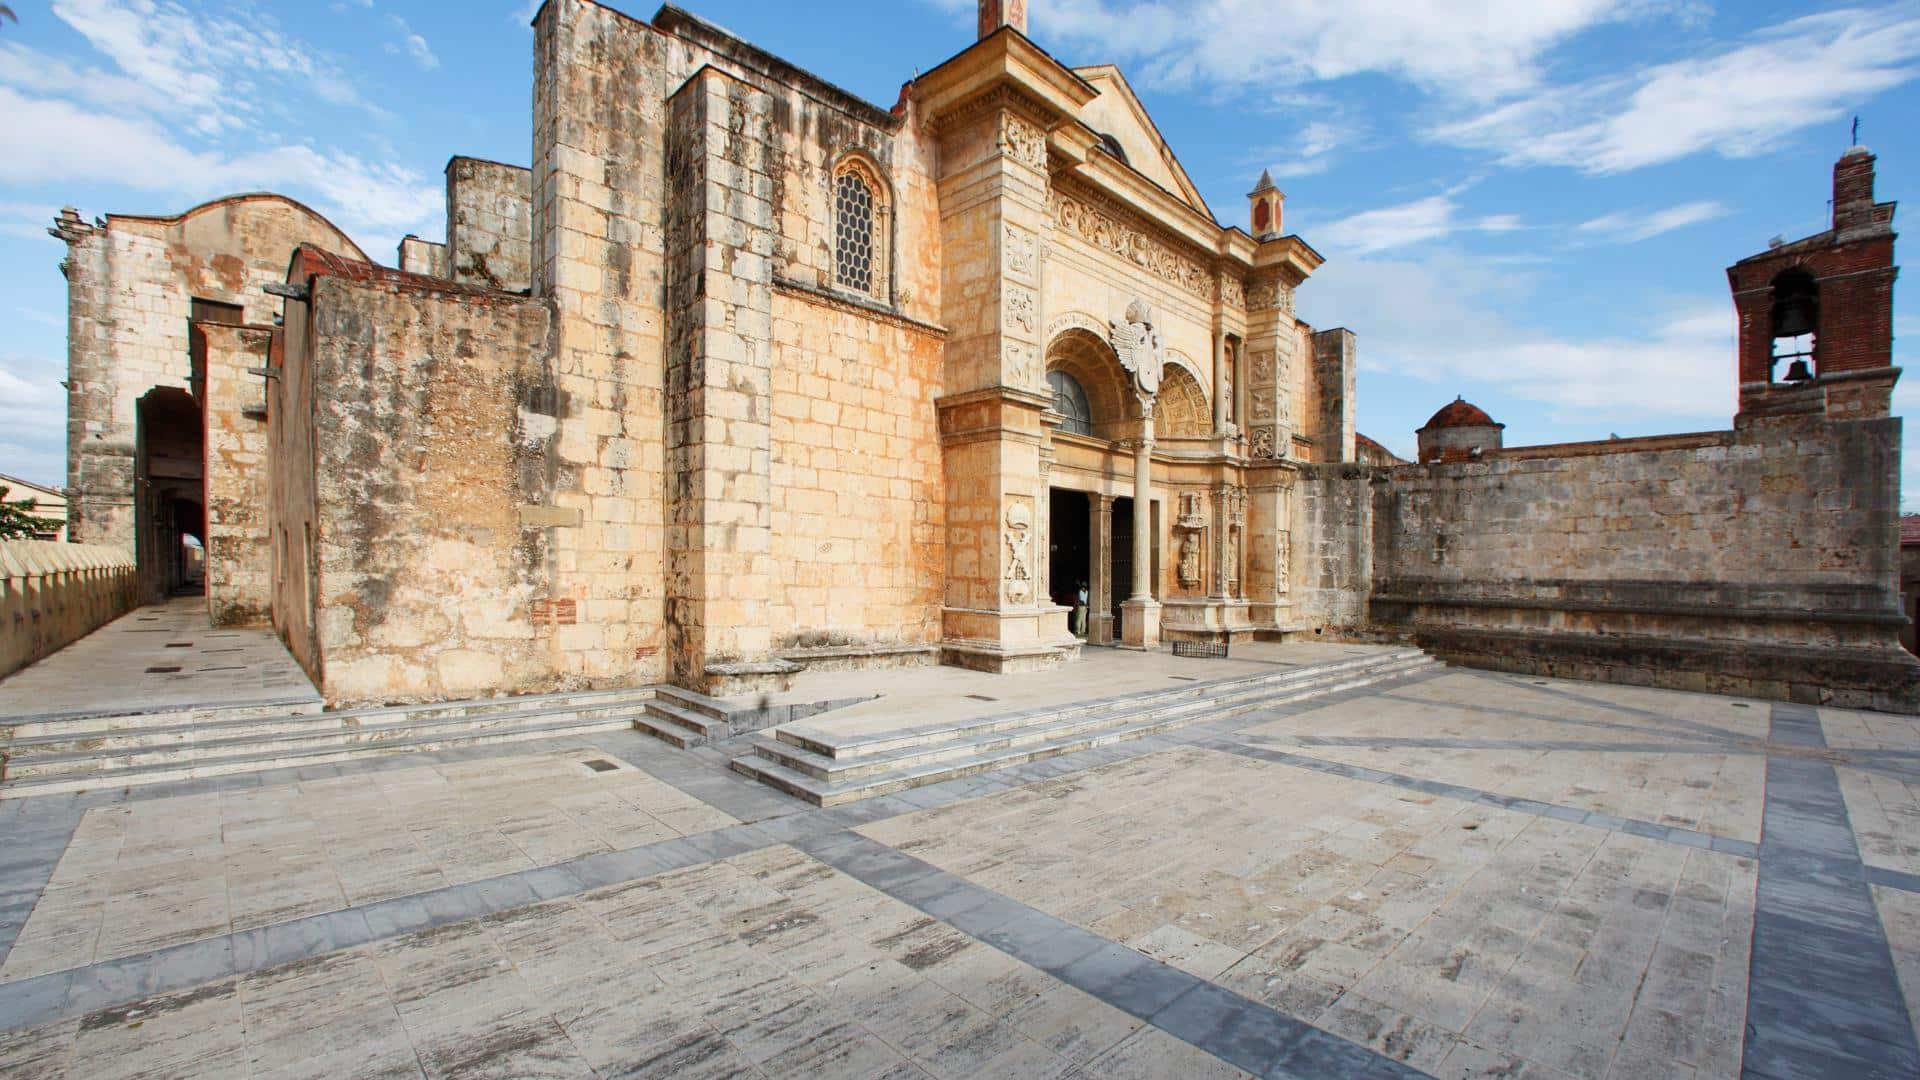 dominican_republic_travel_118_santo_domingo_cathedral_zona_colonial_1920